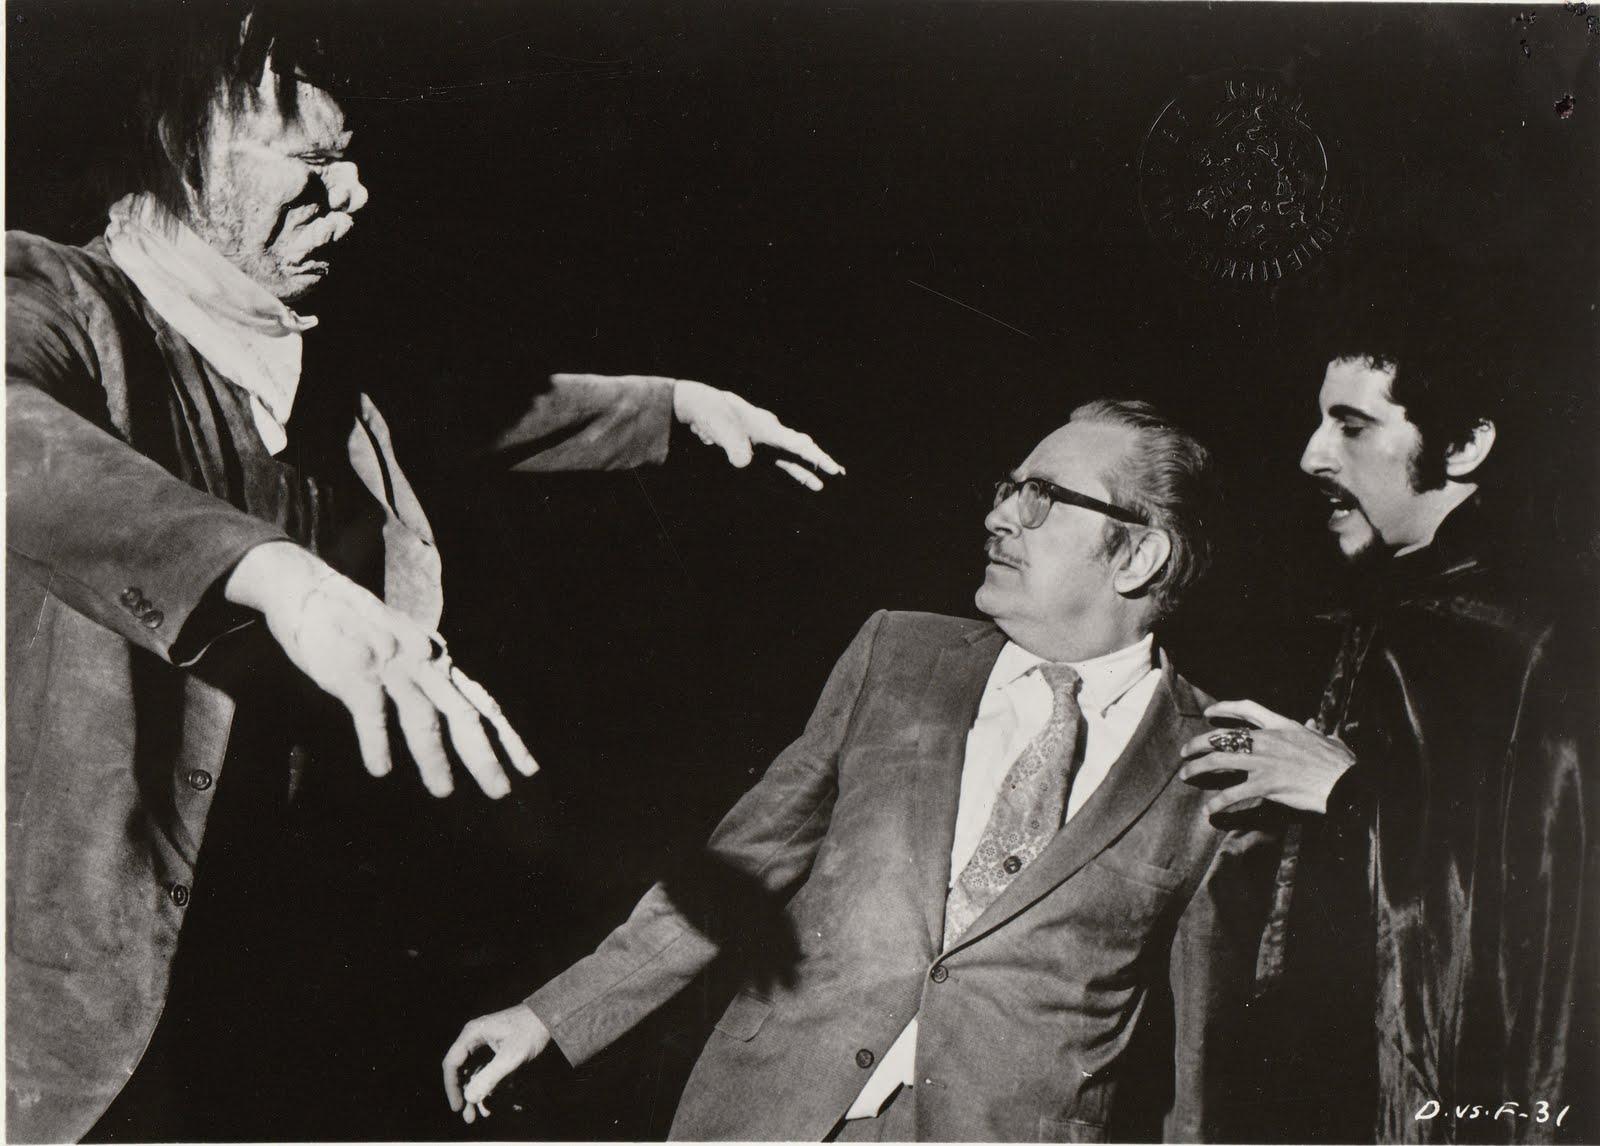 Ackerman Dracula vs Frankenstein